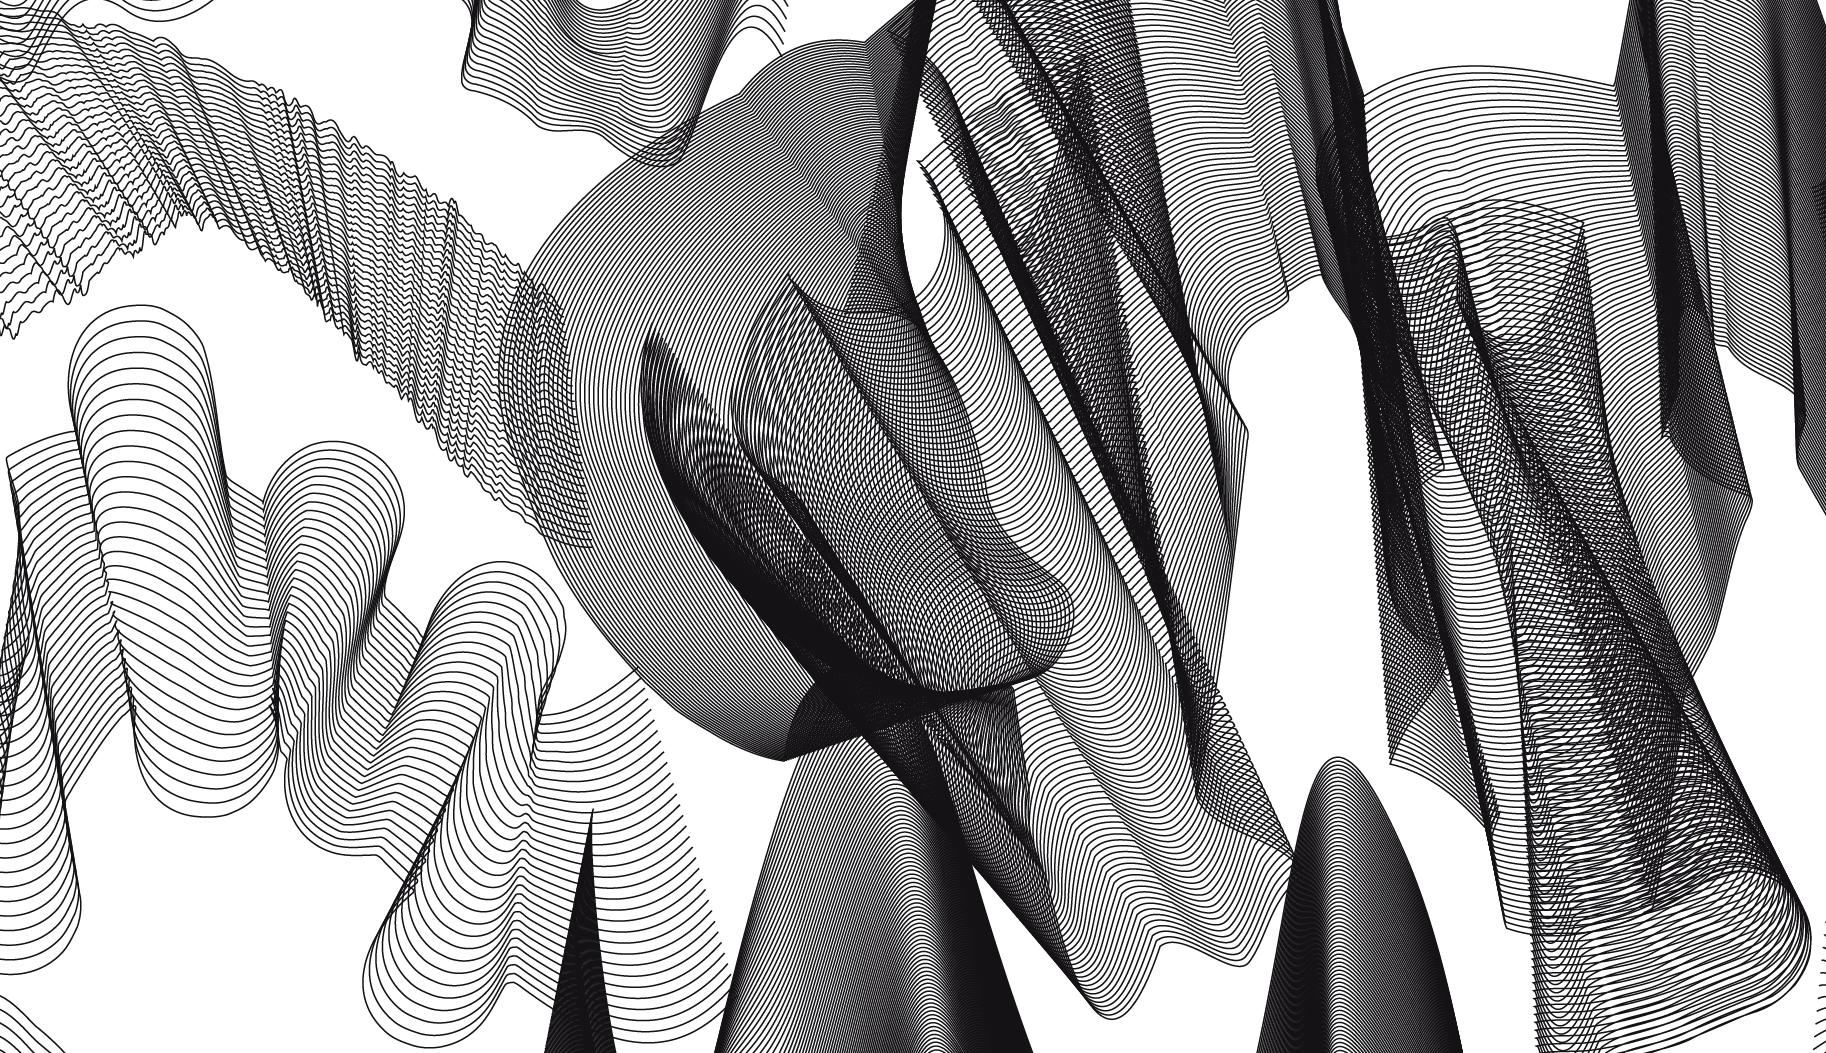 Vectorwellen - Photoshop Brush